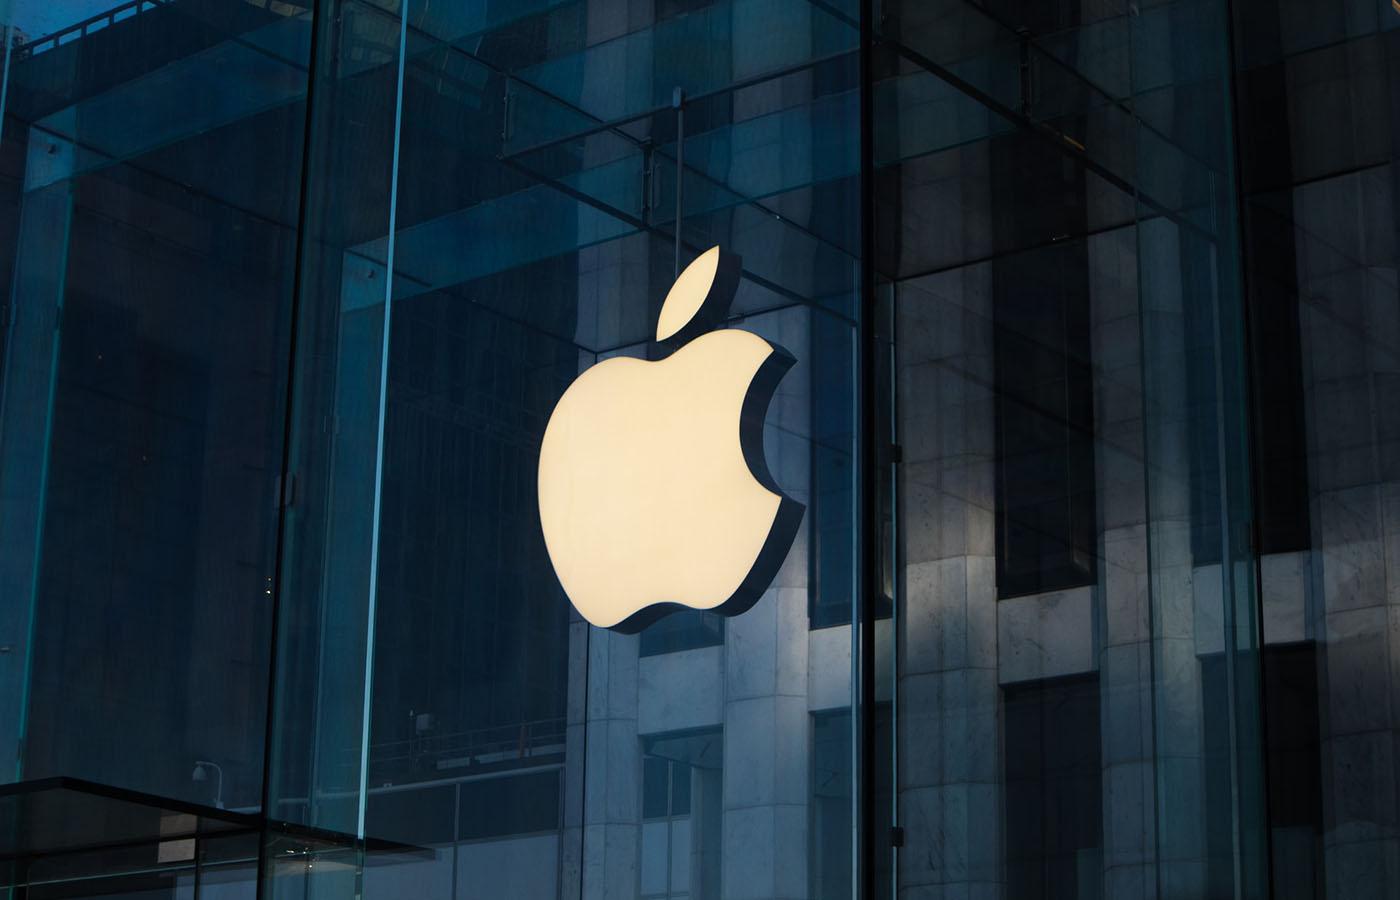 😱 Nova vakansija: Apple šukaje menedžera z dosvidom roboty z kryptoplatežamy